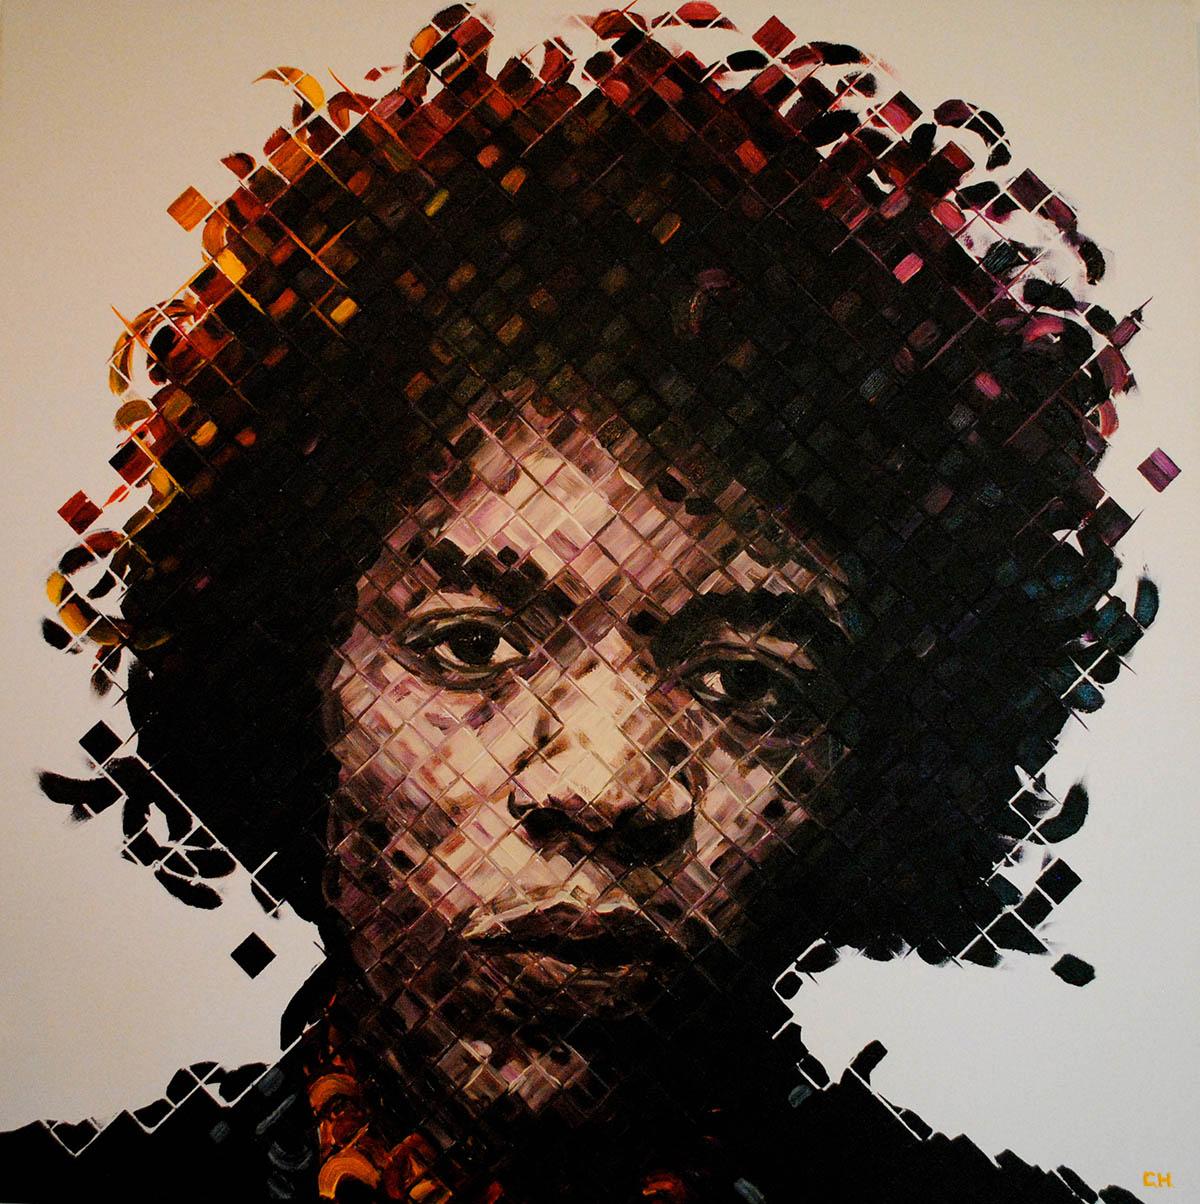 Jimi Hendrix Painting by Miami artist Charlie Hanavich Art